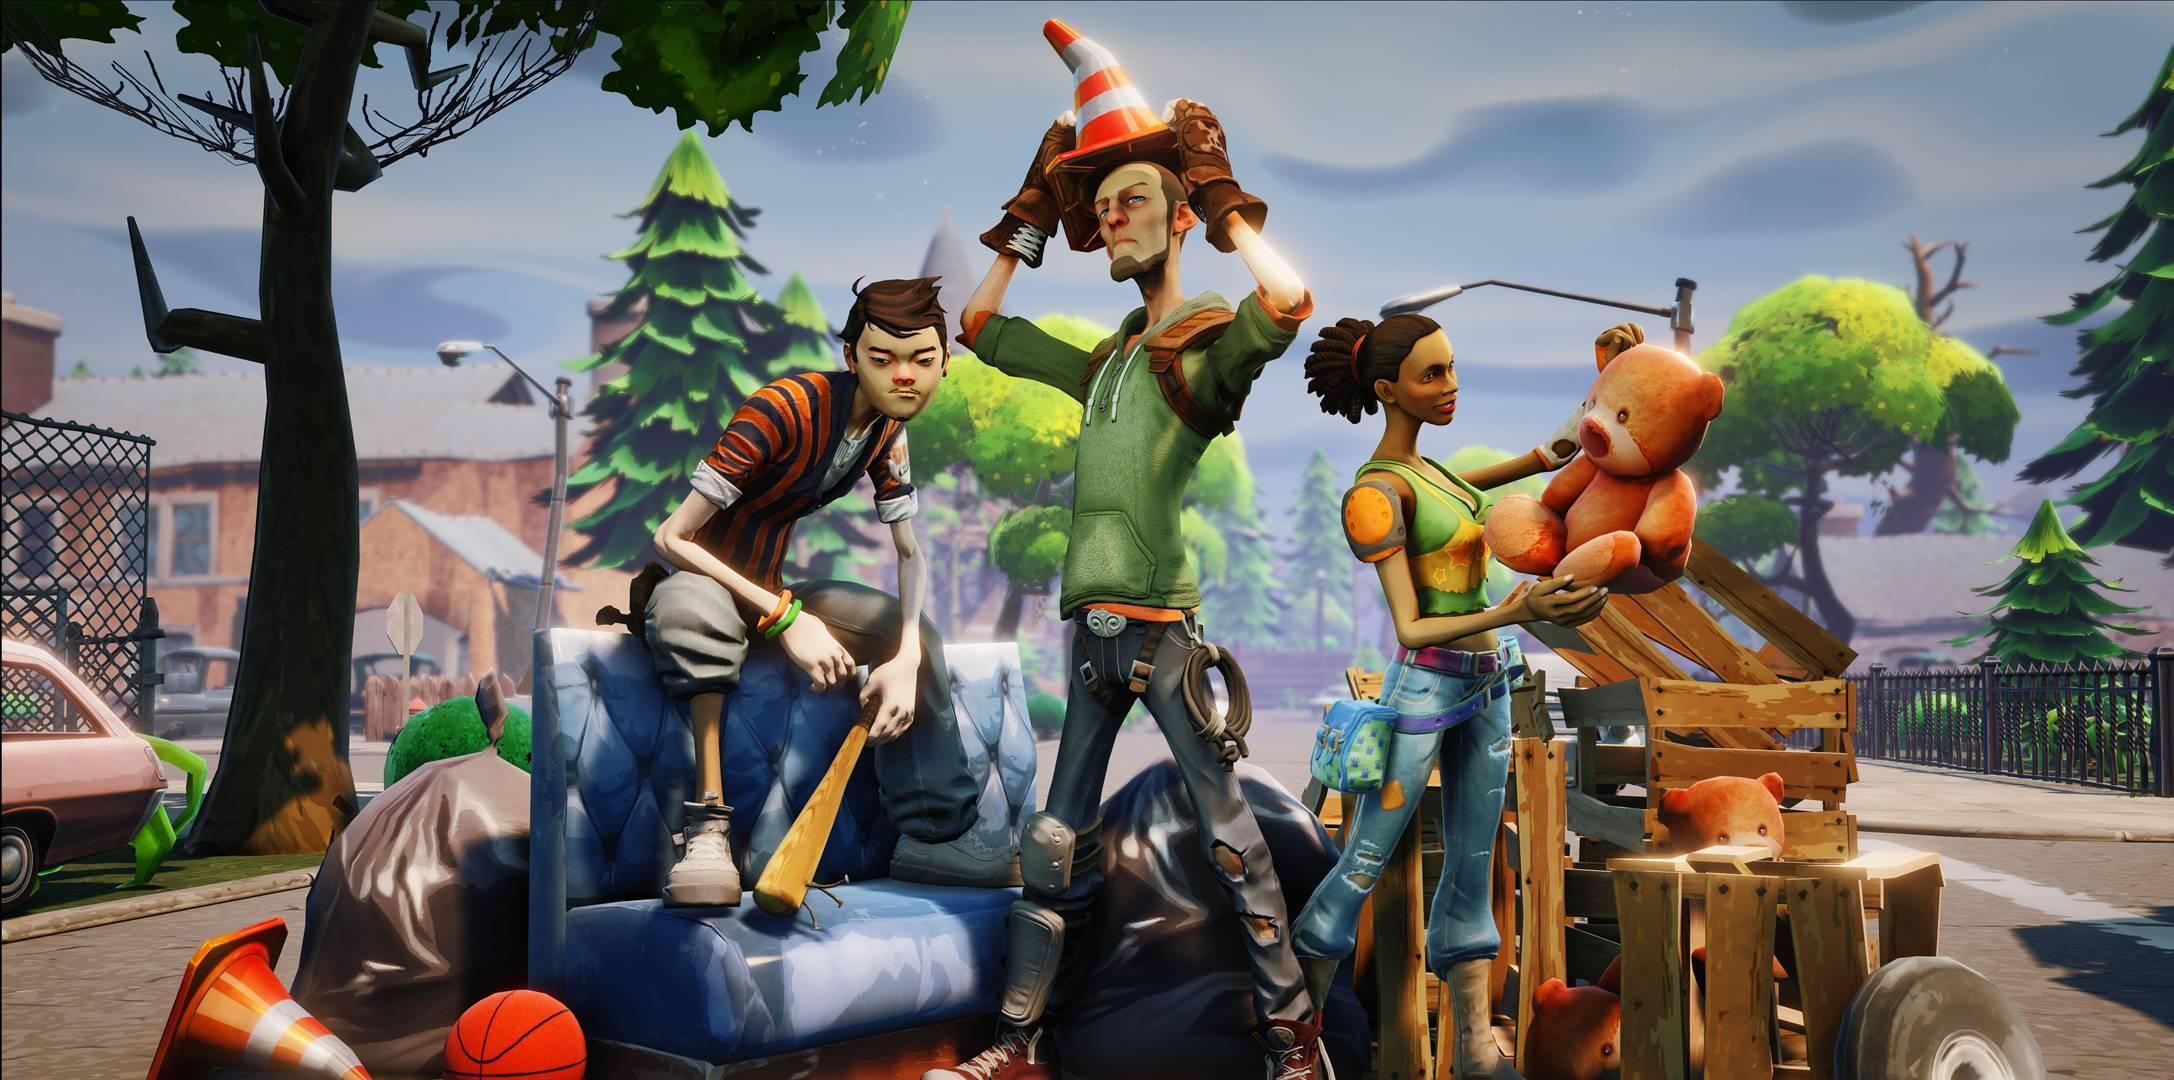 epic games fortnite wallpaper GamingBoltcom Video Game News 2174x1080